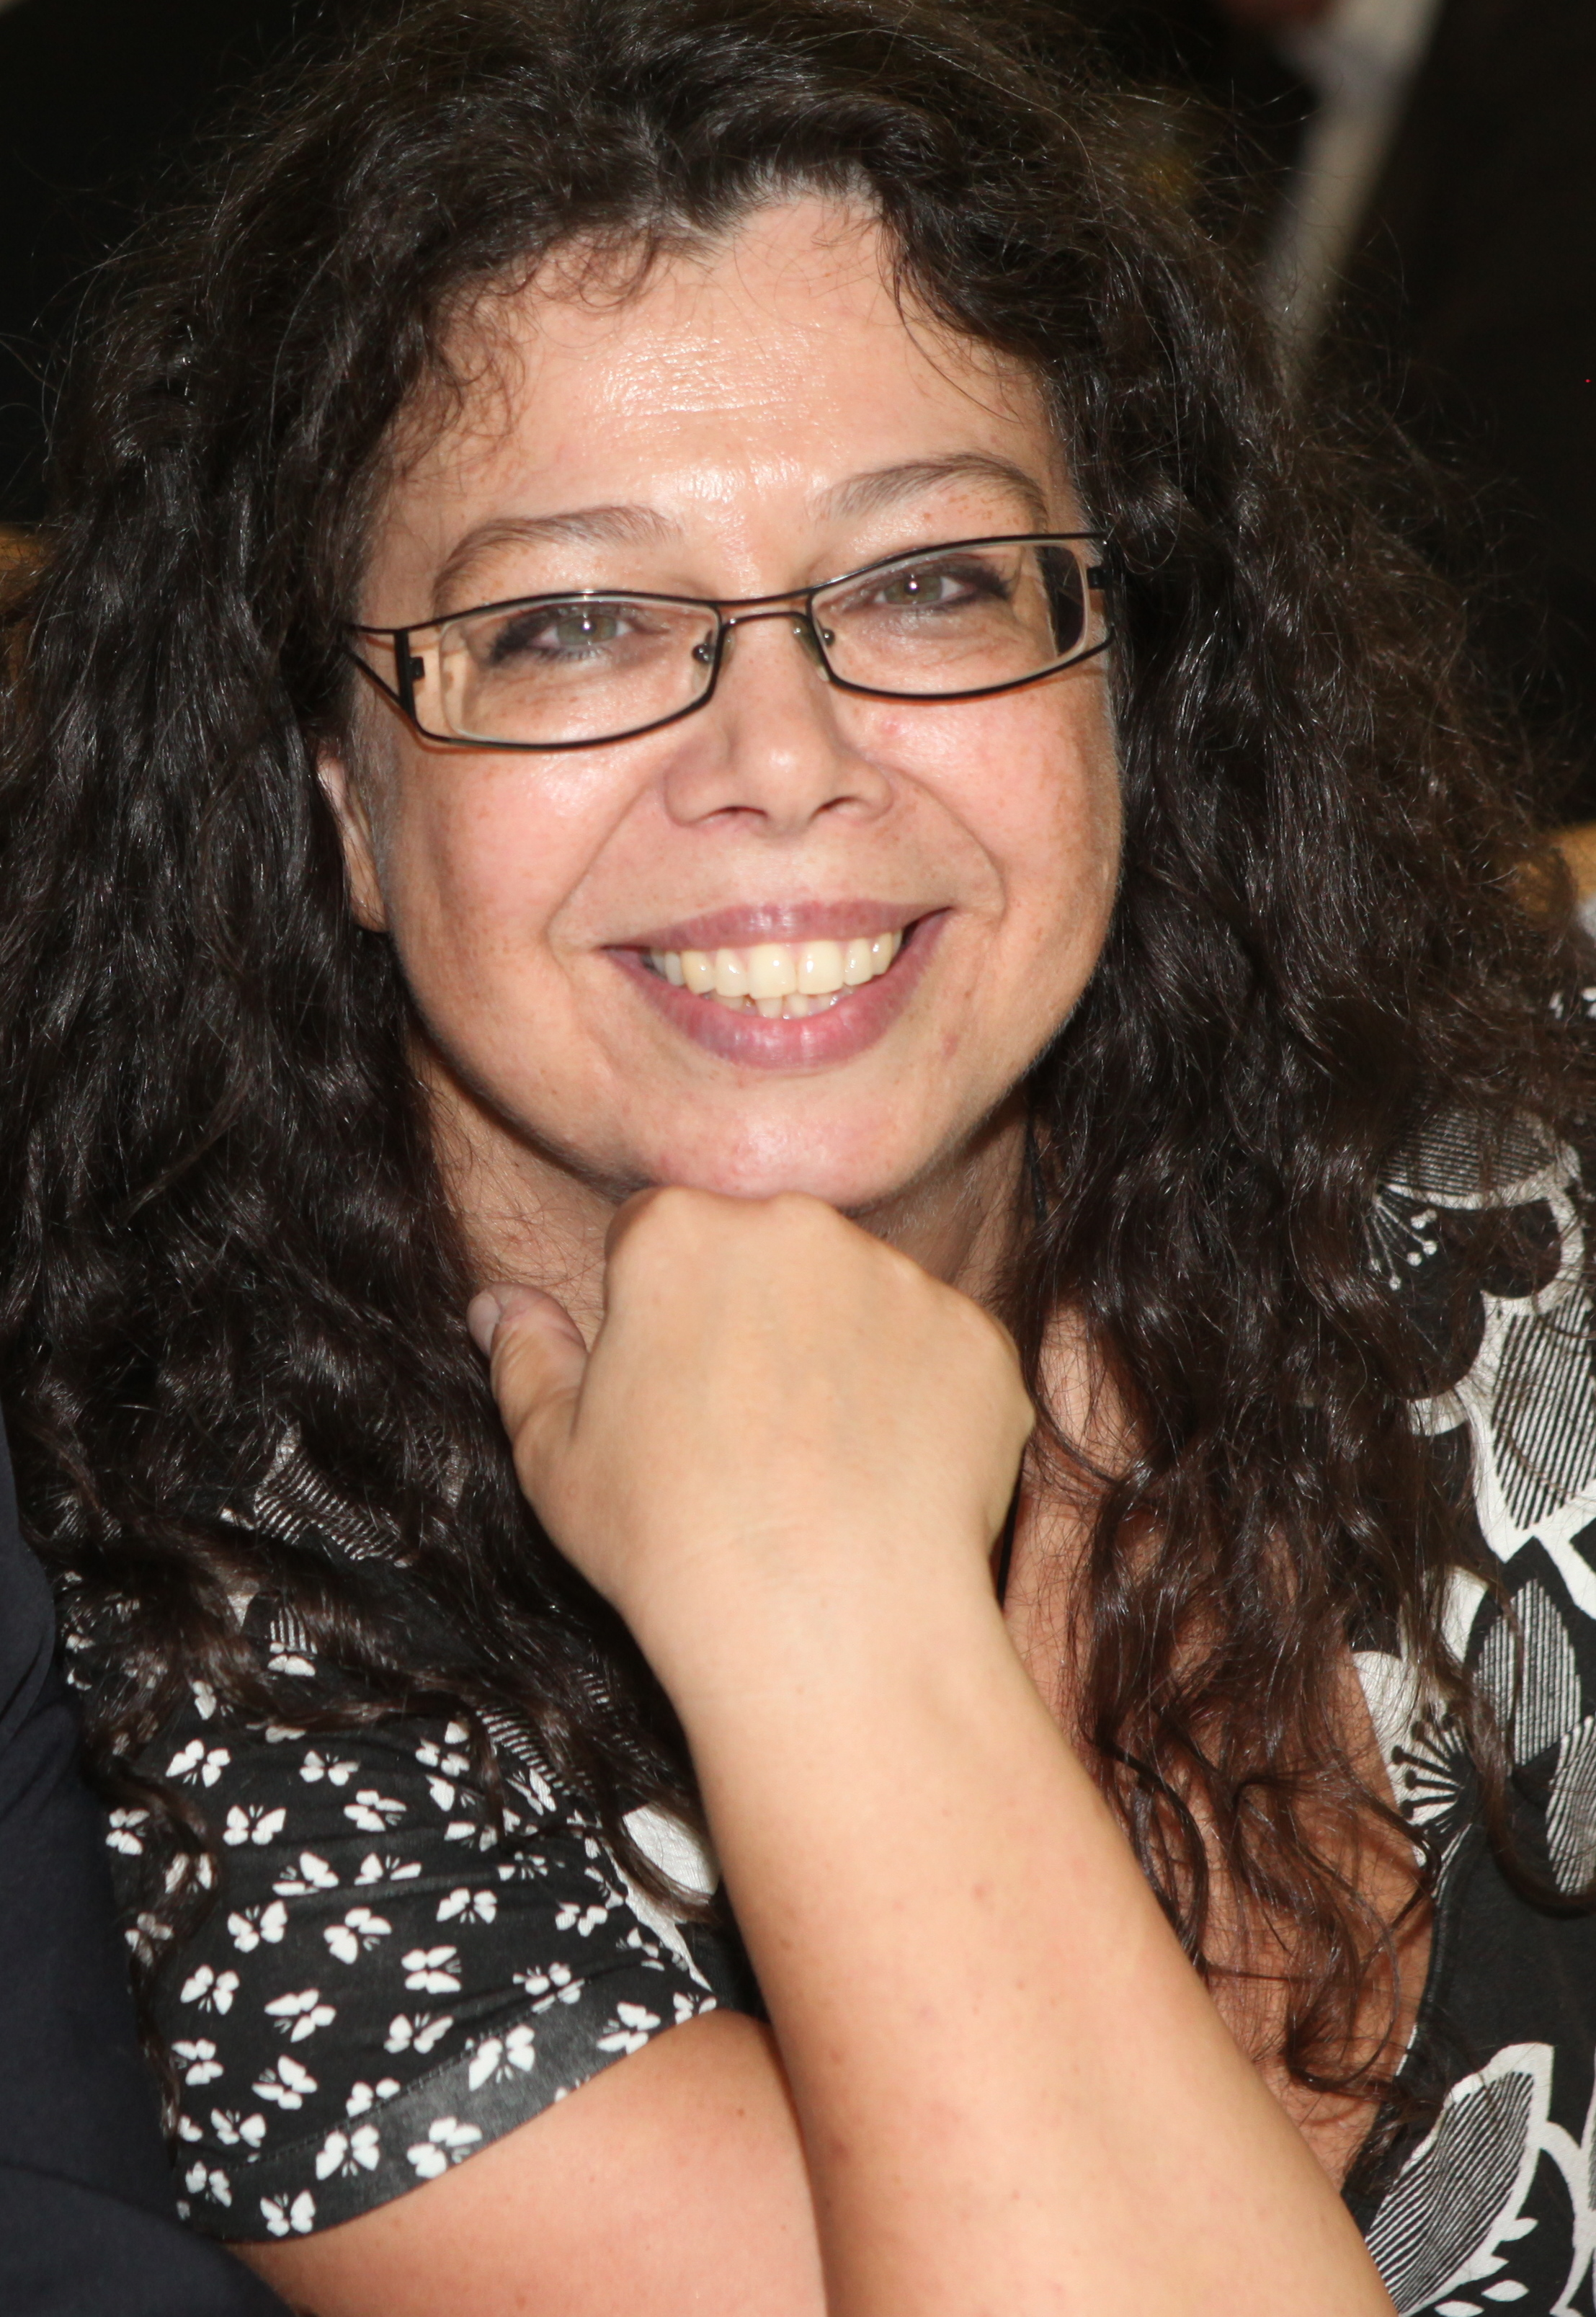 Zuzana Cseplo